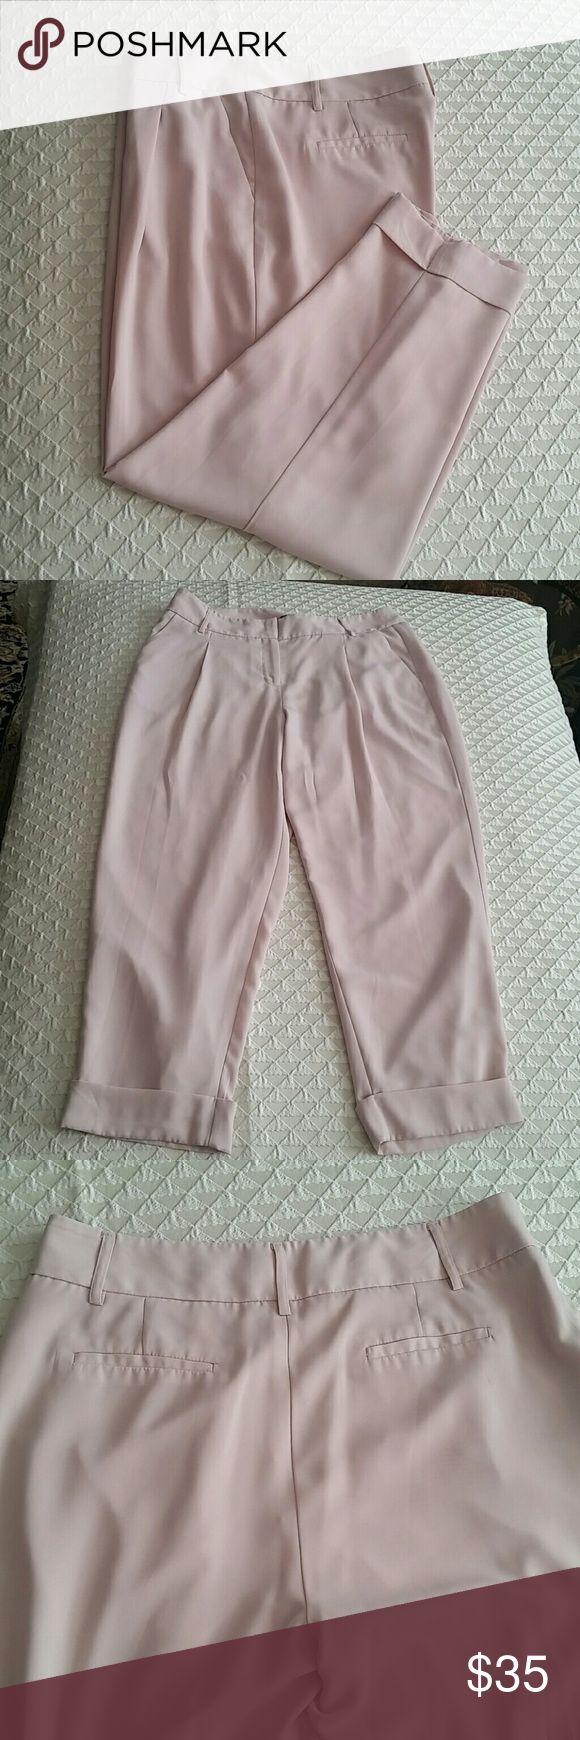 "NWOT JENNIFER LOPEZ PANTS Photos do not capture the beauty of these Fab pants! Nude easy care 100% Polyester feels like Silk. 2 side pockets, 2 back fake pockets. Fully lined.  Size 10 Lying flat waist 15.5"" Inseam 26"" Skinny Cuffed Leg 7"". Jennifer Lopez Pants"